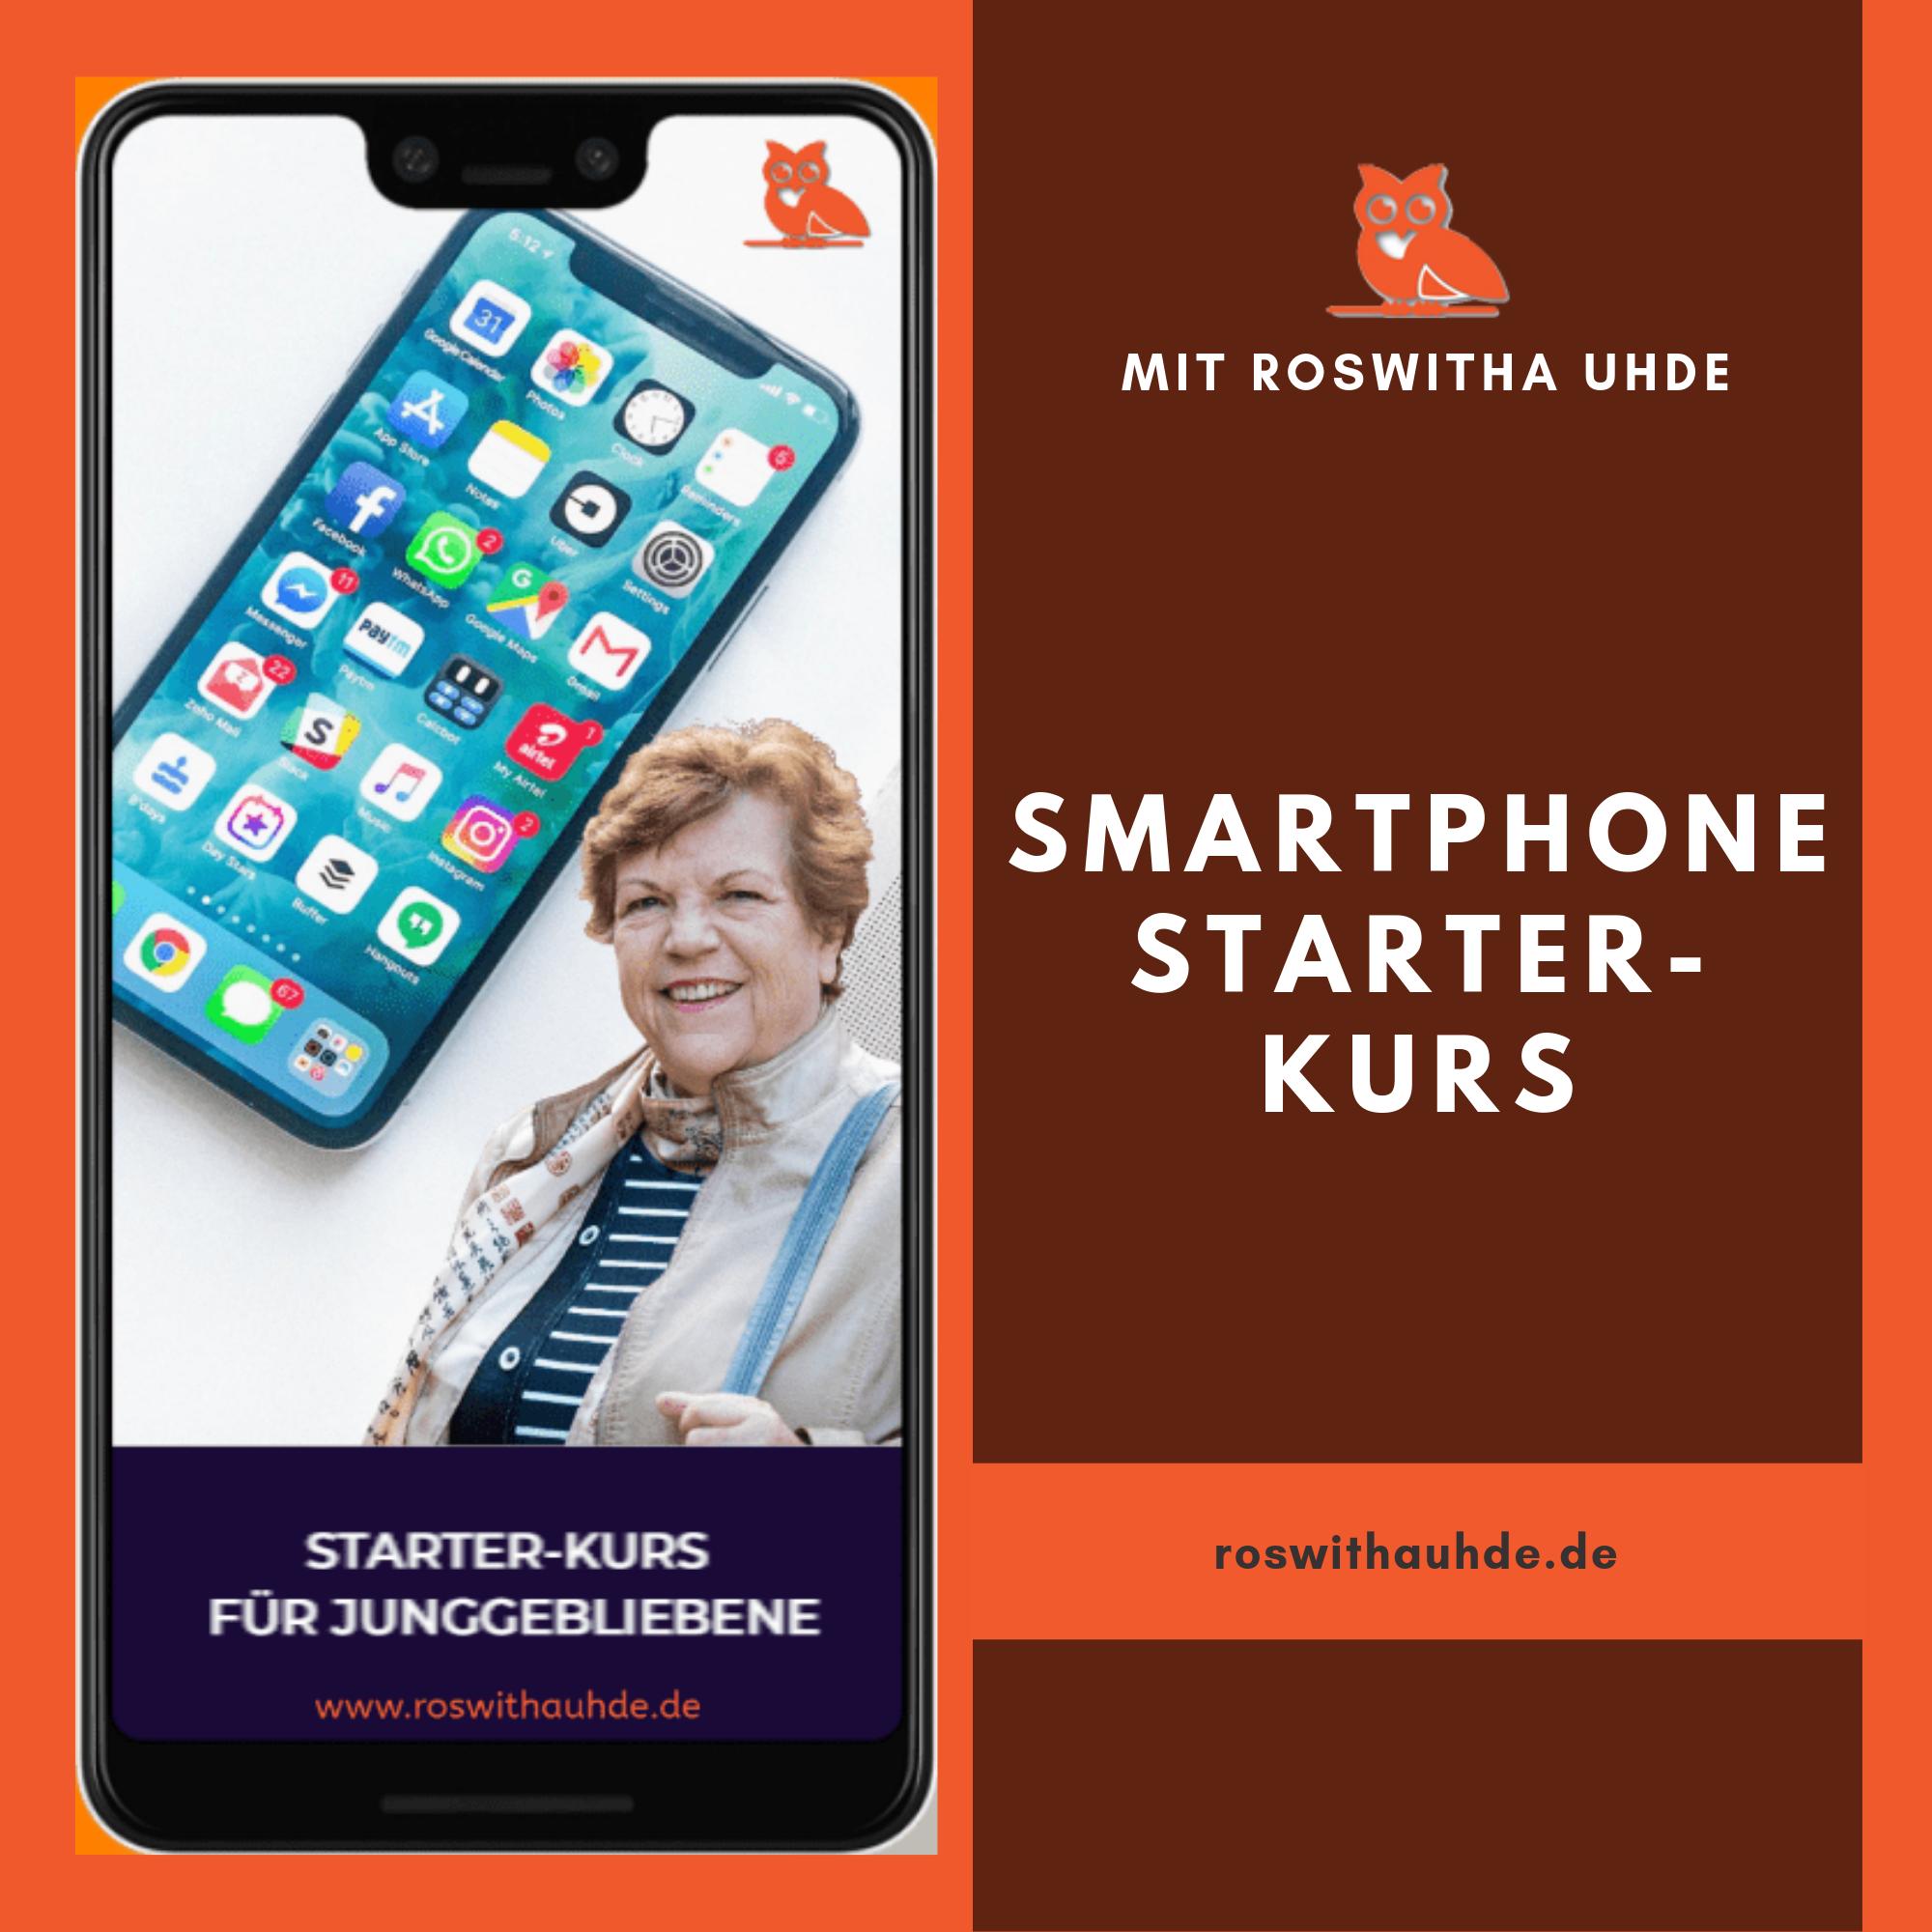 SMARTPHONE STARTER-KURS